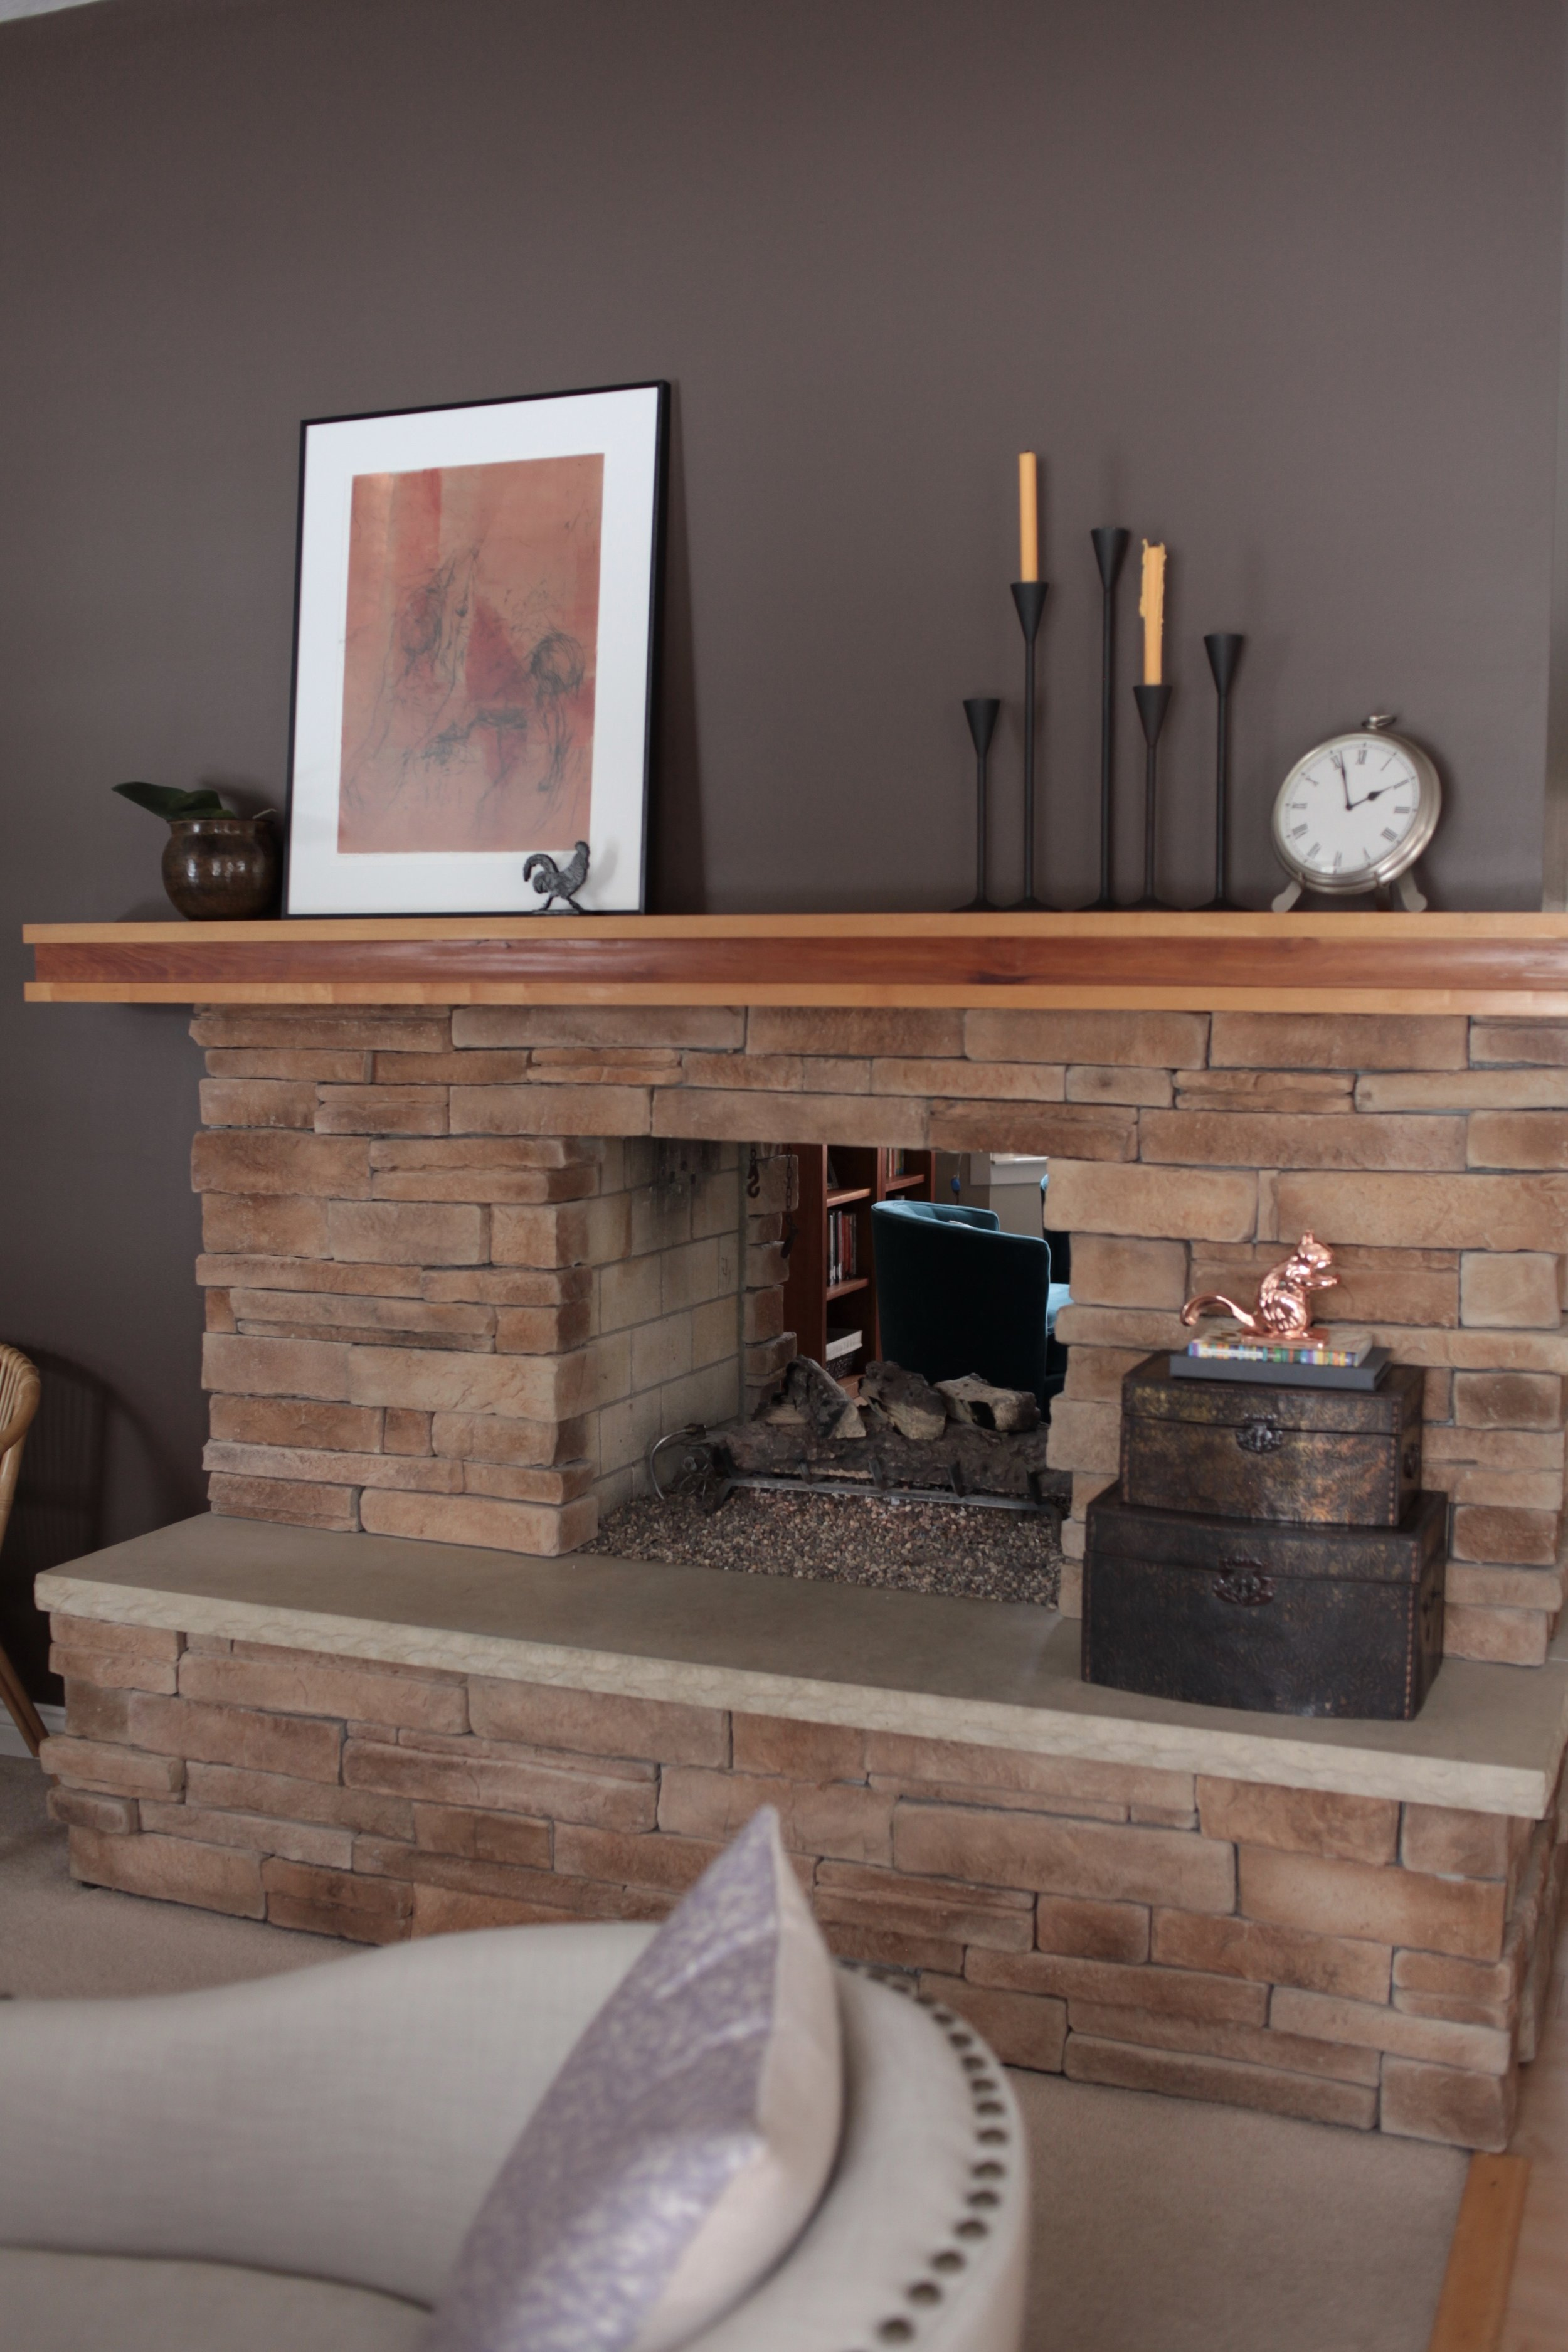 Styled large fireplace with modern black candlesticks and orange art.jpeg